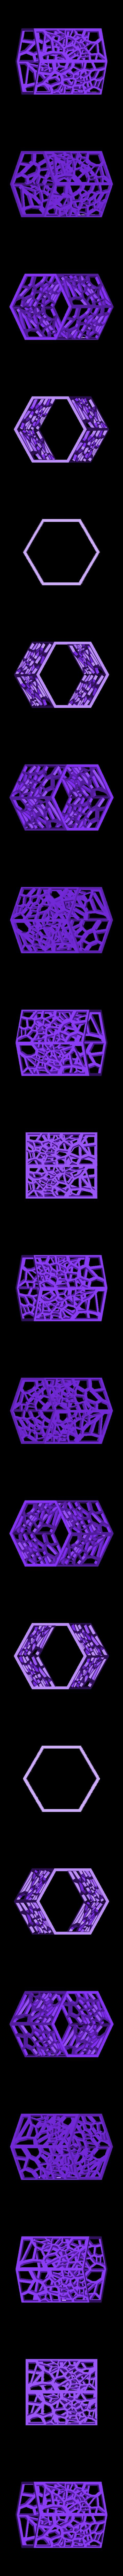 hexagonal-winerack-voronoi.stl Download free STL file Modular Hex Drawers • Design to 3D print, O3D